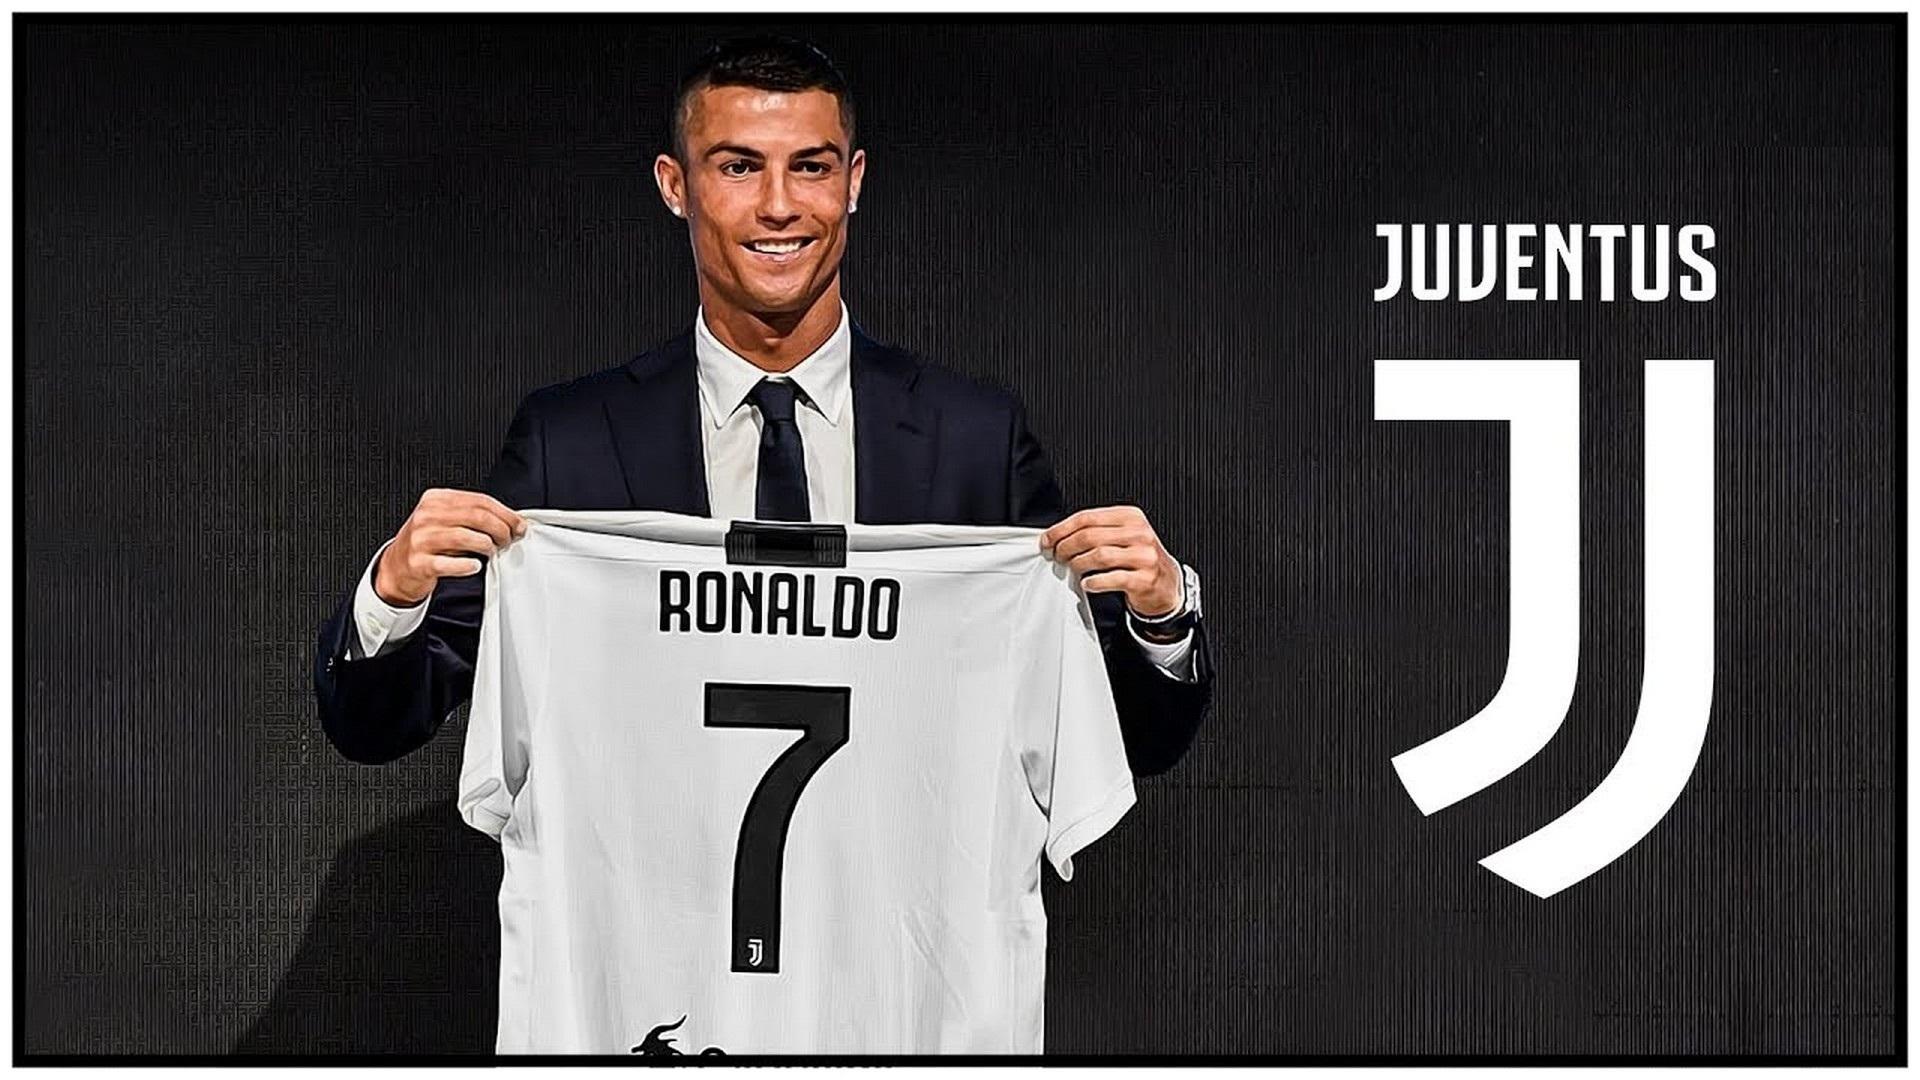 Best Cristiano Ronaldo Juventus Wallpaper 2020 Cute Wallpapers 1920x1080